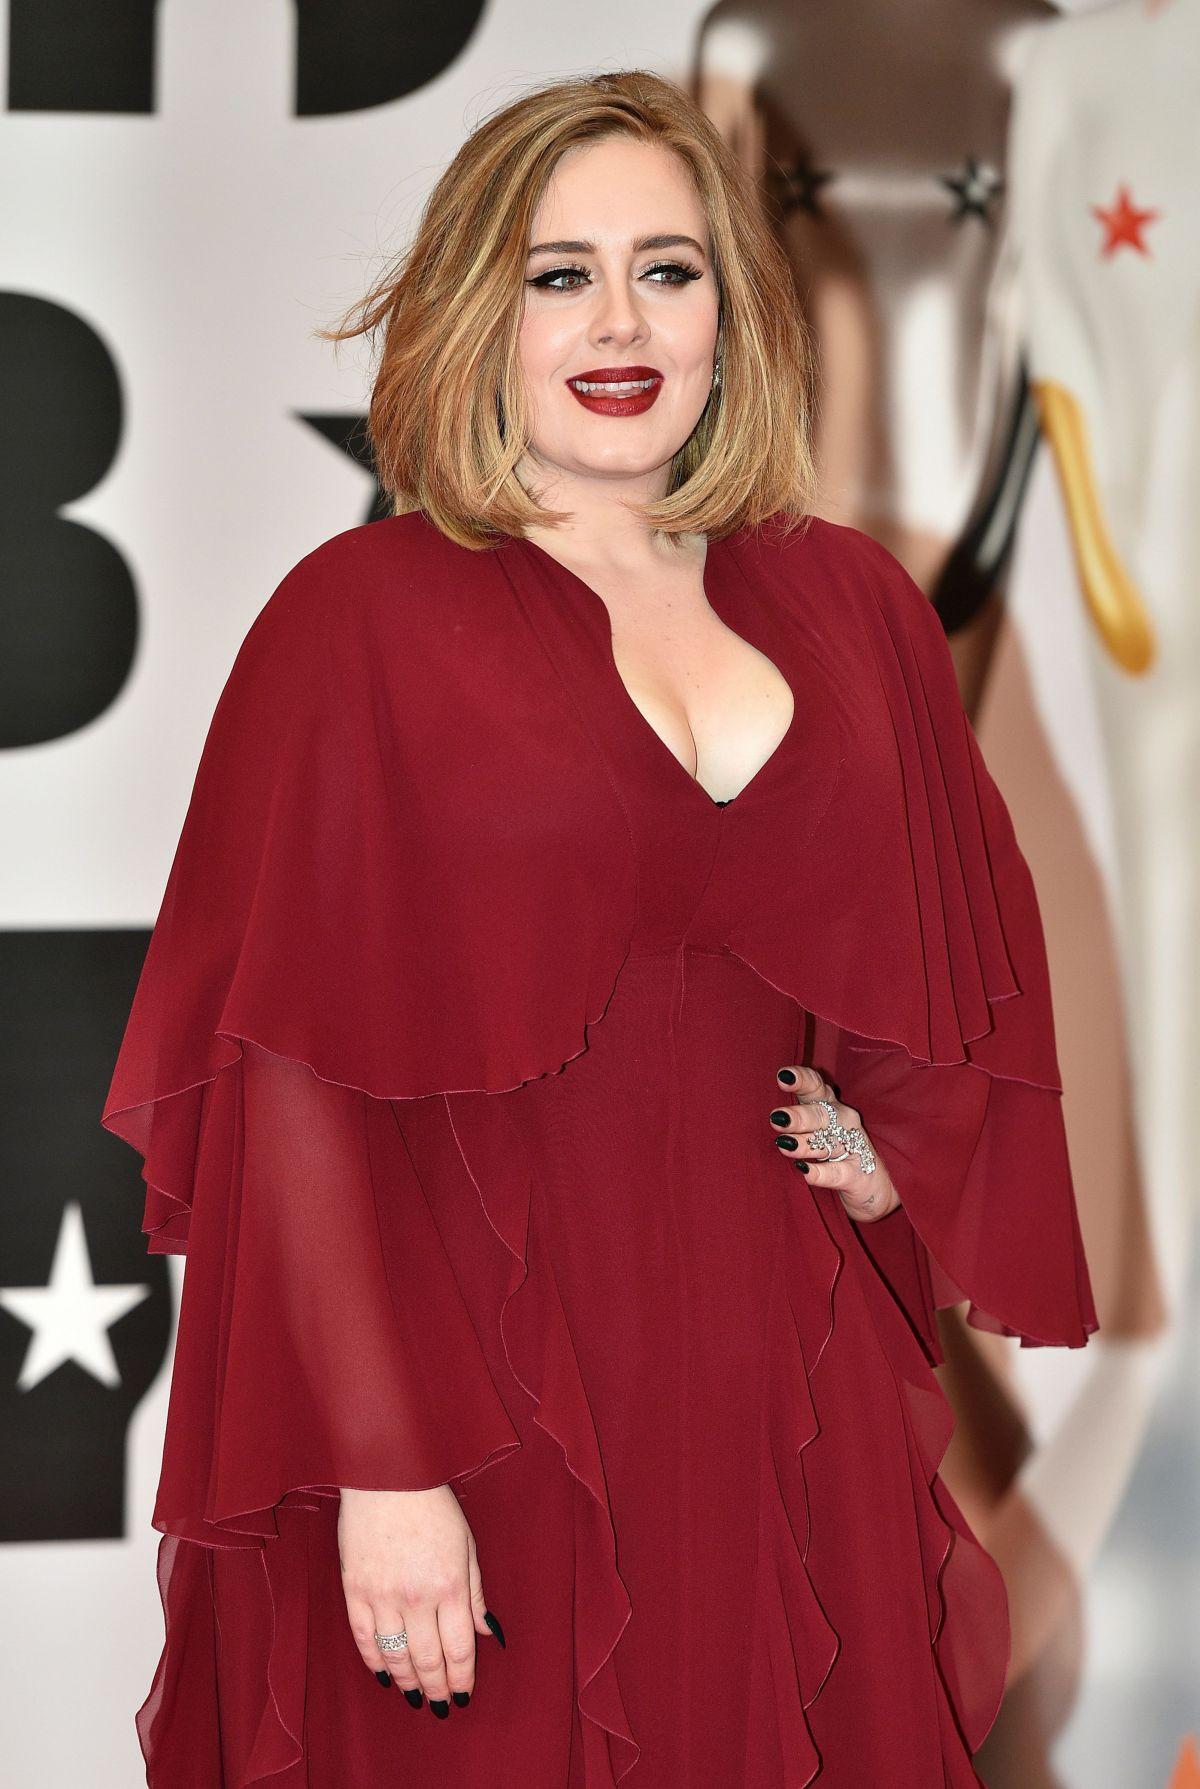 ADELE at Brit Awards 2016 in London 02/24/2016